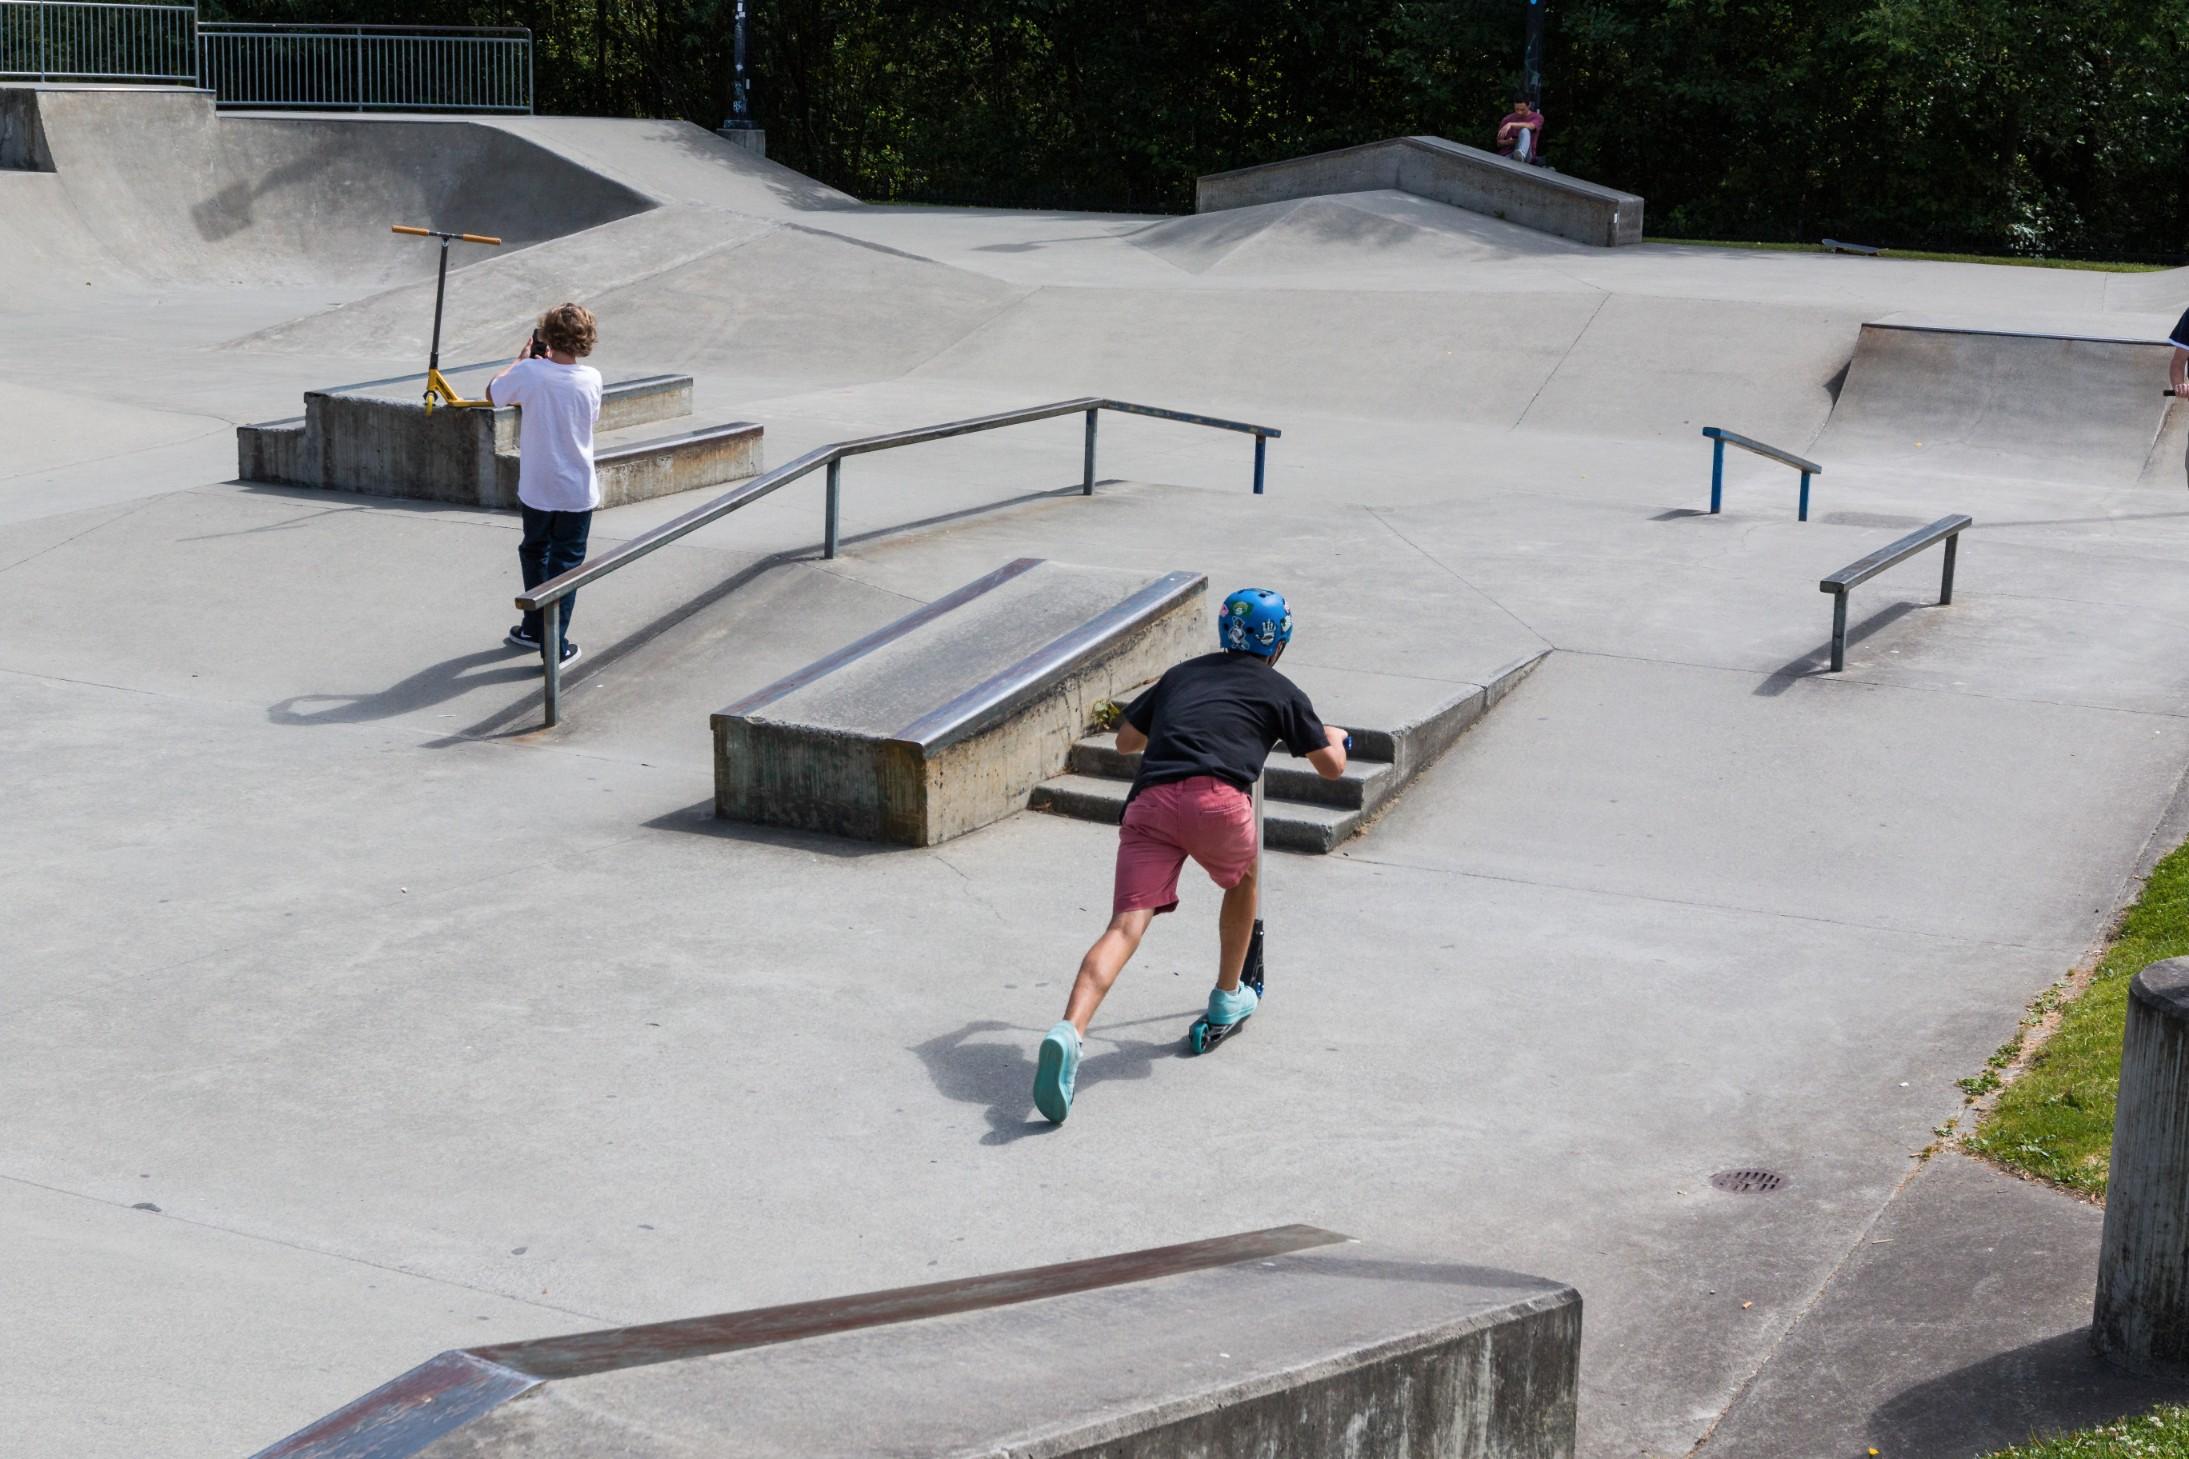 WindermereNorth_Woodinville_SkatePark.jpg